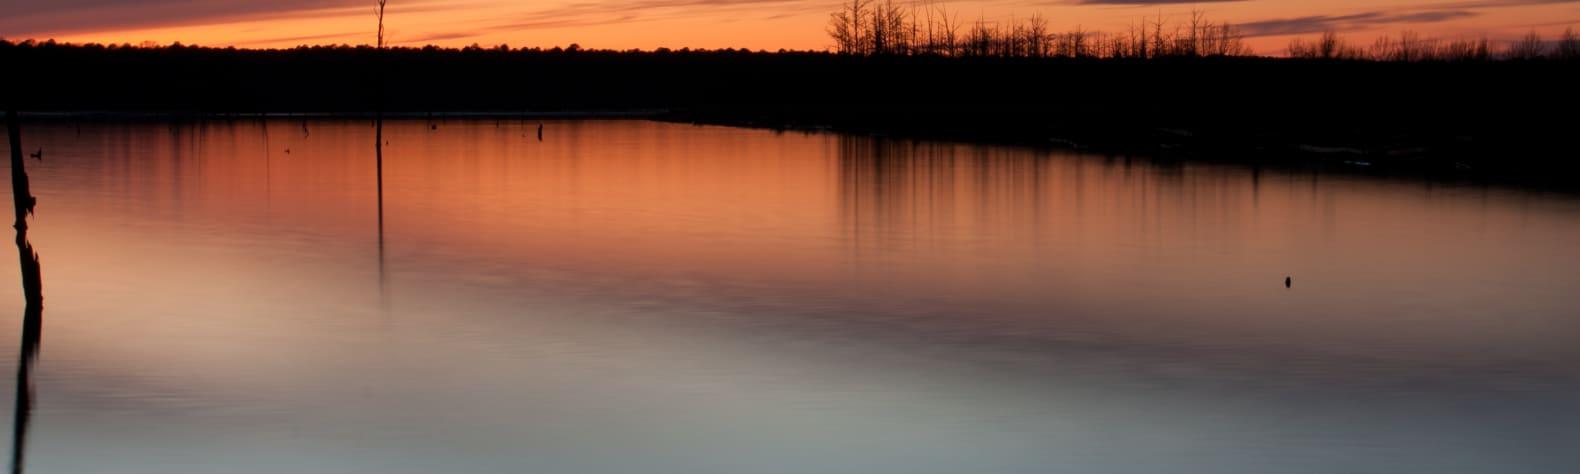 Cane Creek State Park